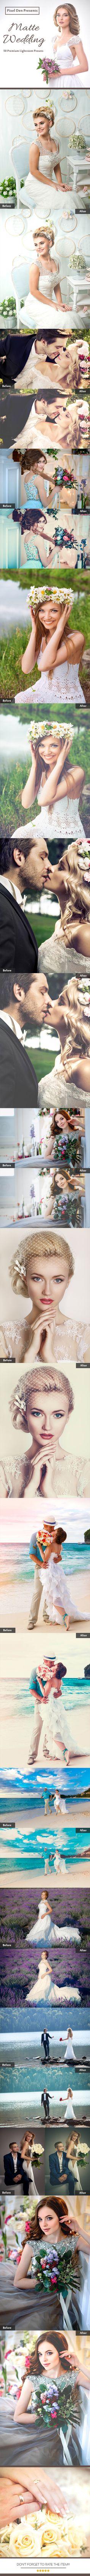 50 Premium Matte-Wedding Lightroom Presets. Download here: http://graphicriver.net/item/50-premium-mattewedding-lightroom-presets/16595093?ref=ksioks